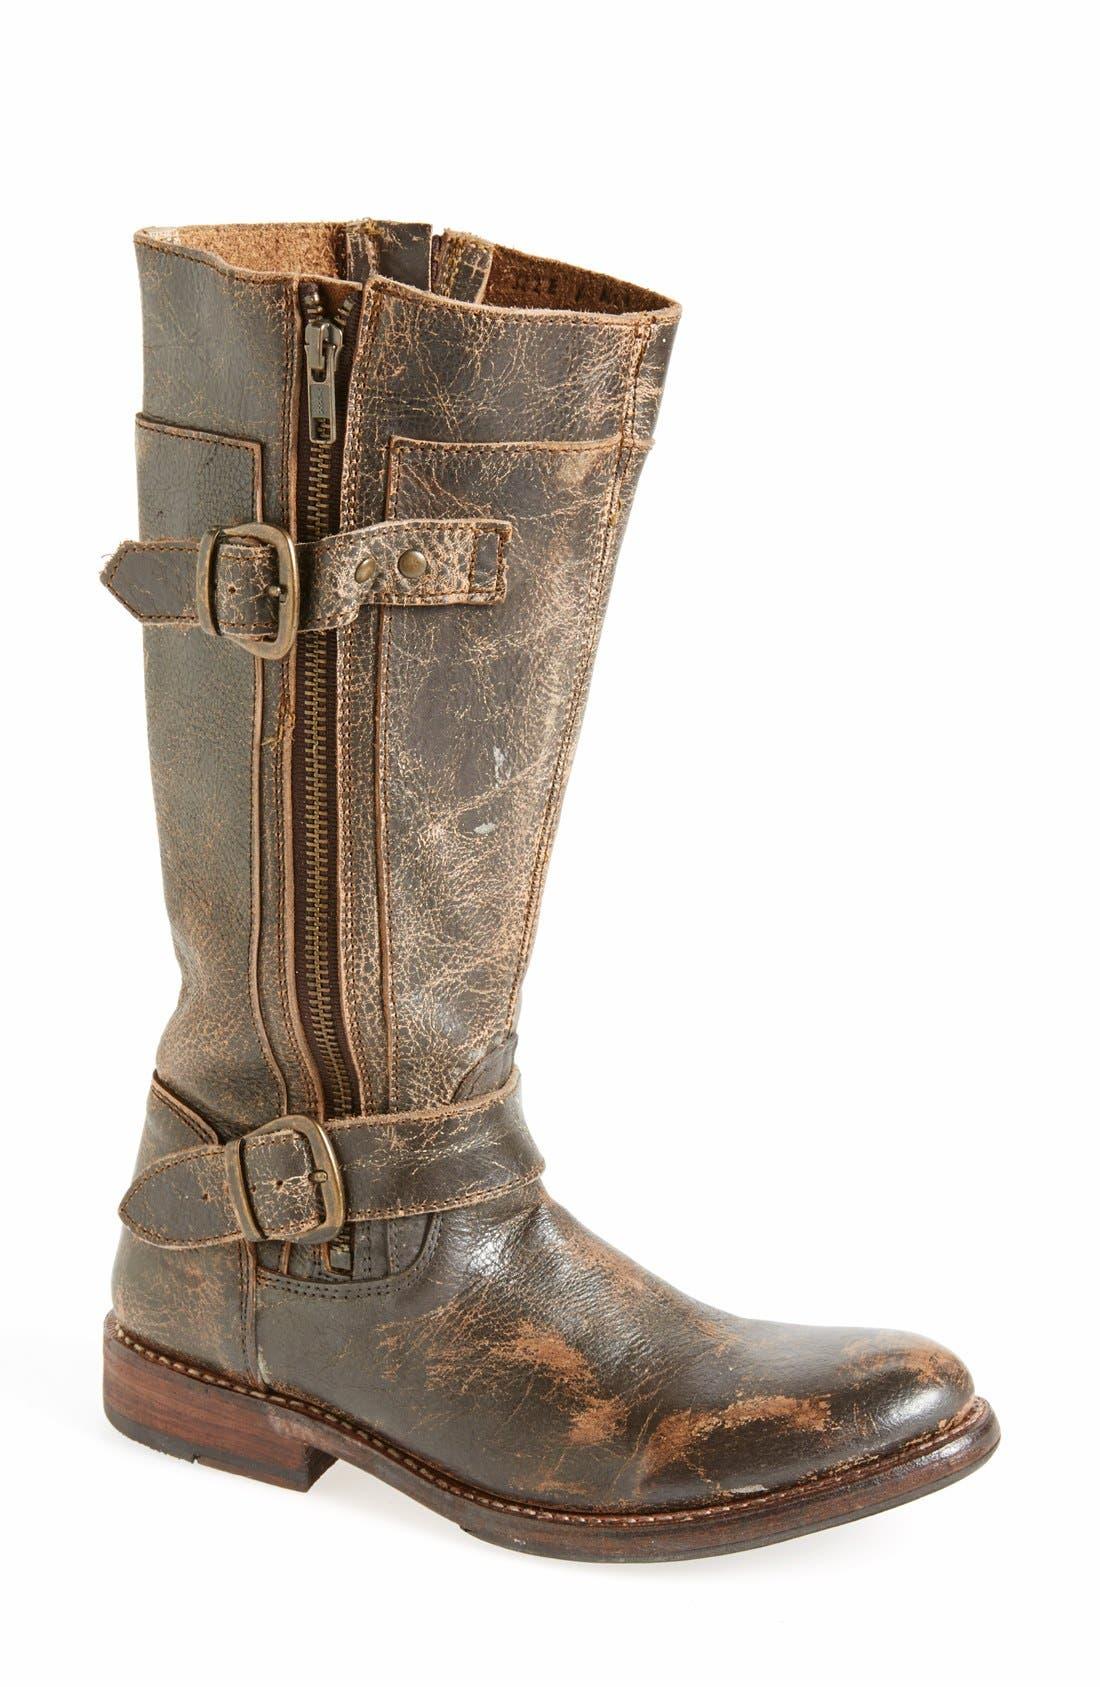 Alternate Image 1 Selected - Bed Stu 'Gogo' Boot